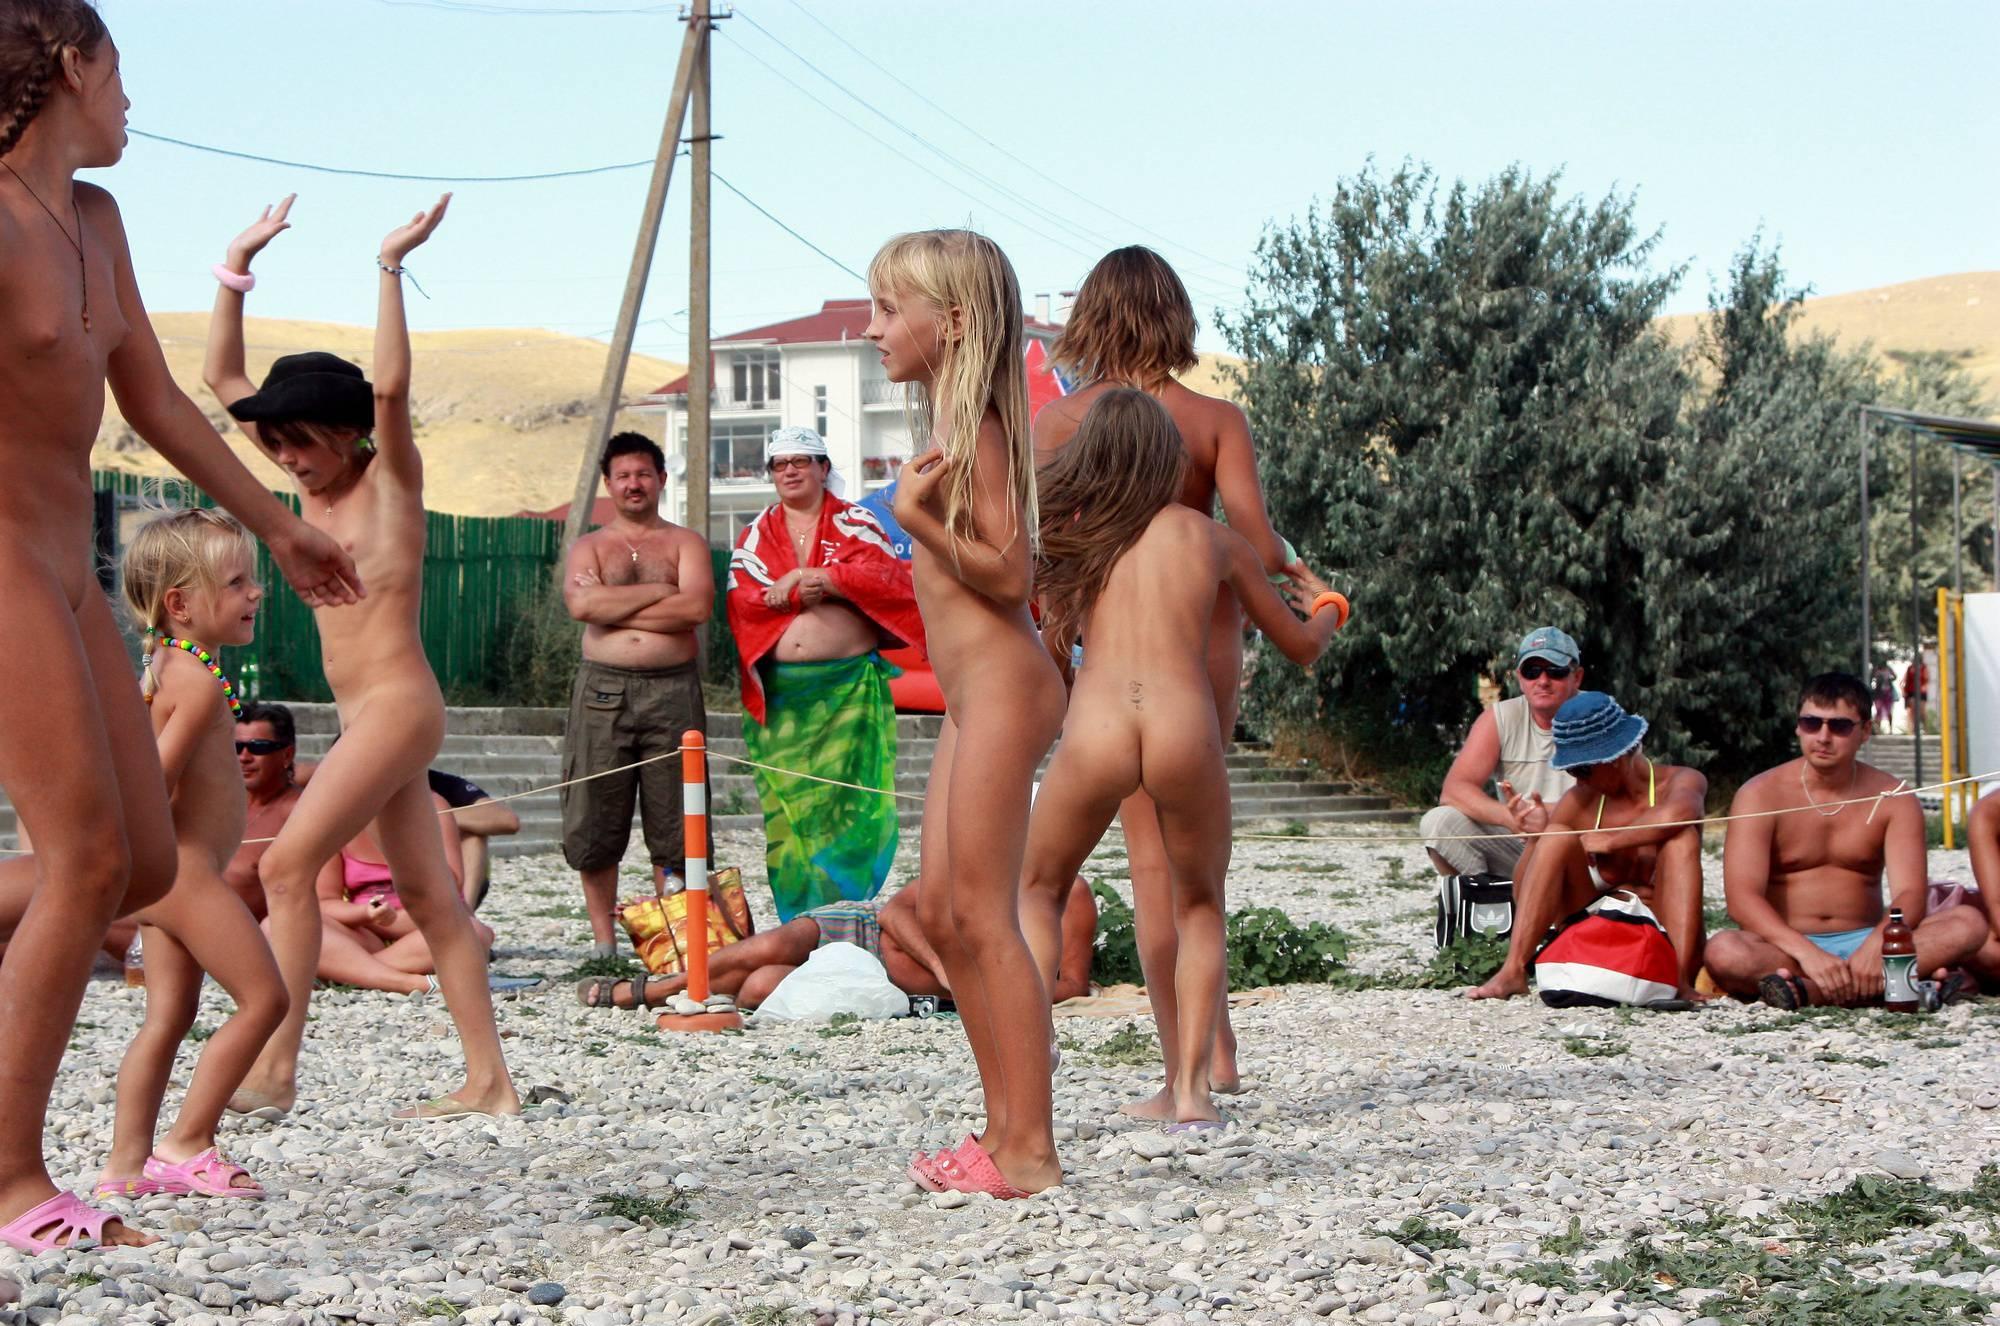 Purenudism Gallery-Cartwheel and Beach Dance - 2